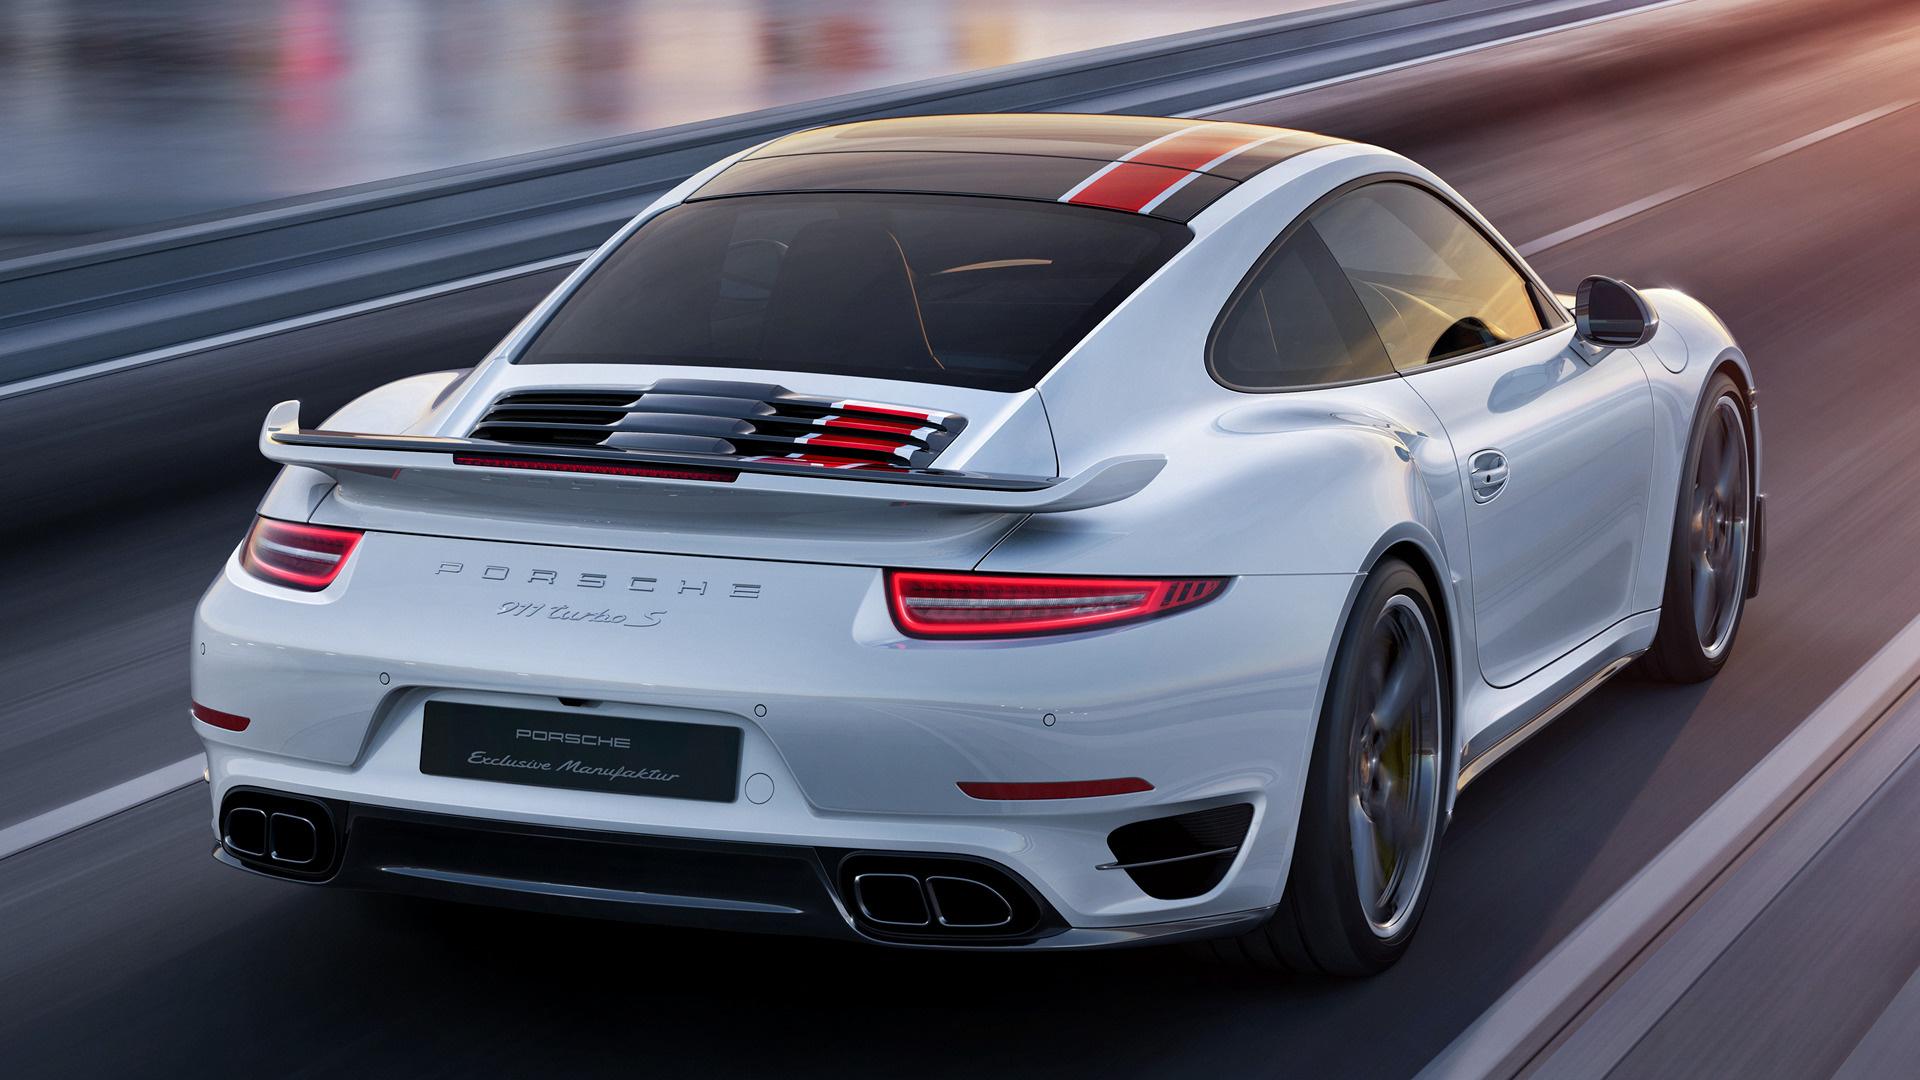 Porsche 911 turbo s sg50 custom built for singapore 2015 sg hd 169 voltagebd Image collections